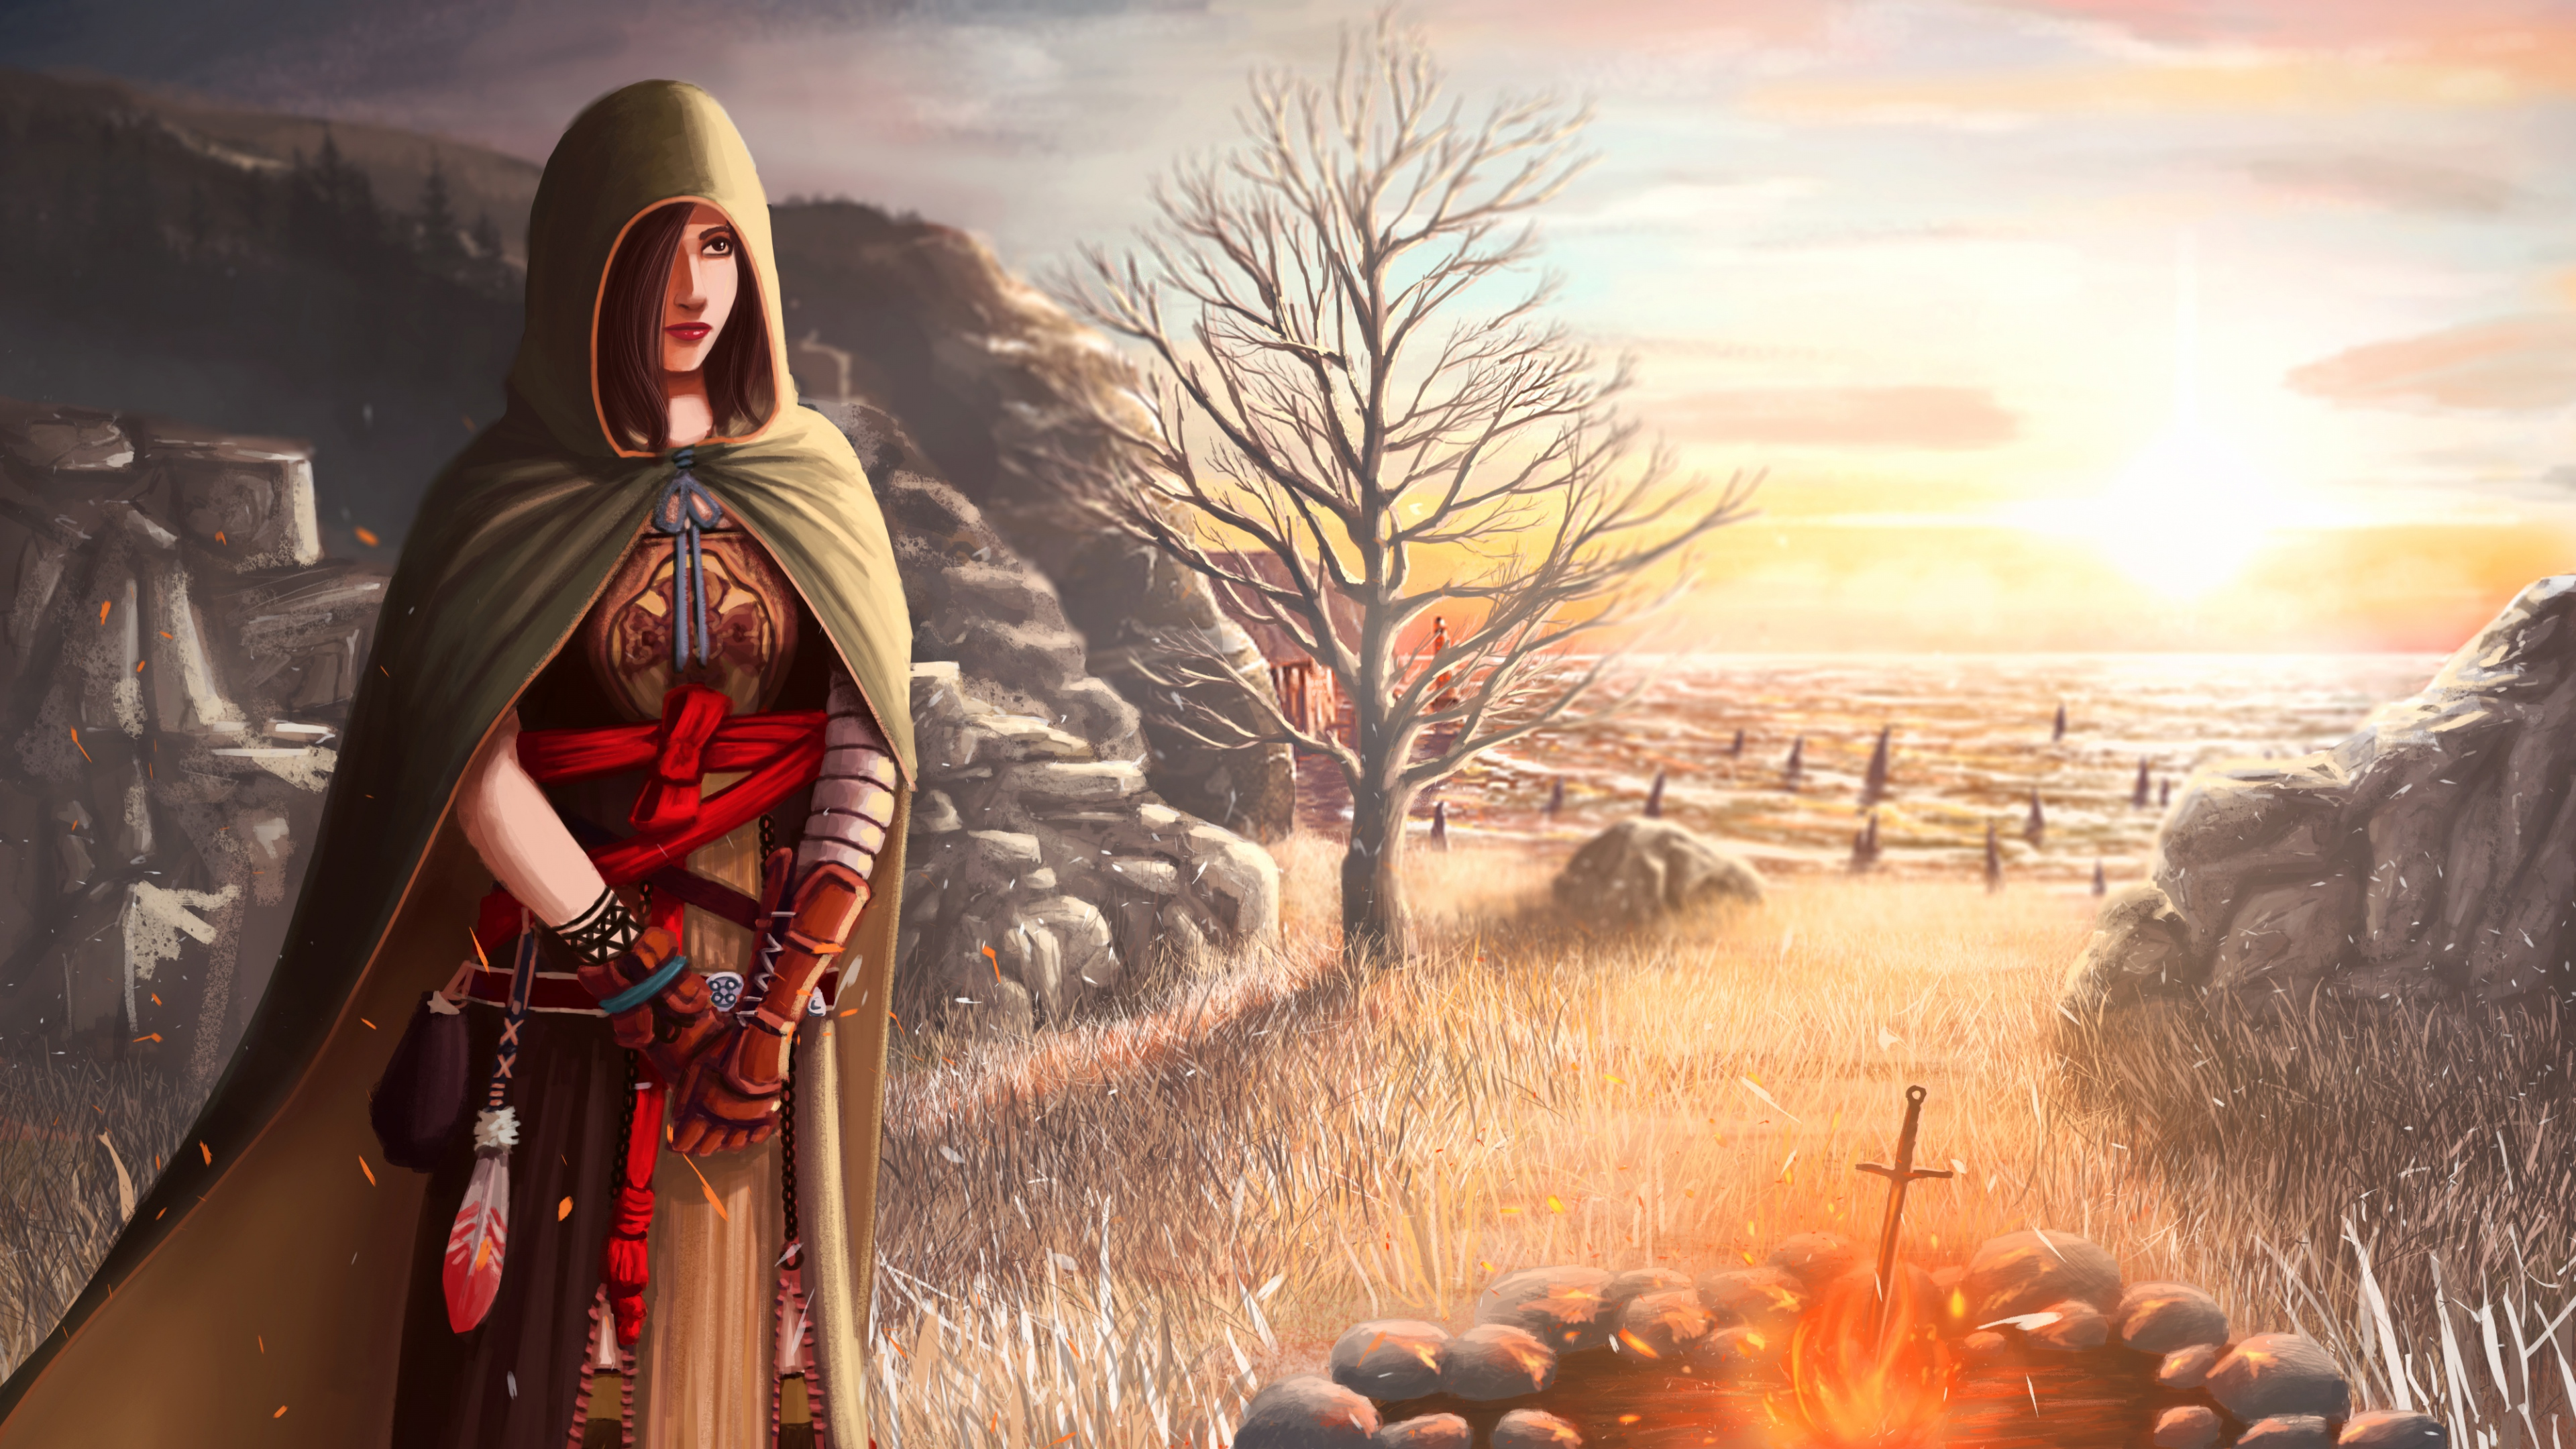 Dark souls II girl 4k Ultra HD Wallpaper | Background Image | 3840x2160 |  ID:717208 - Wallpaper Abyss